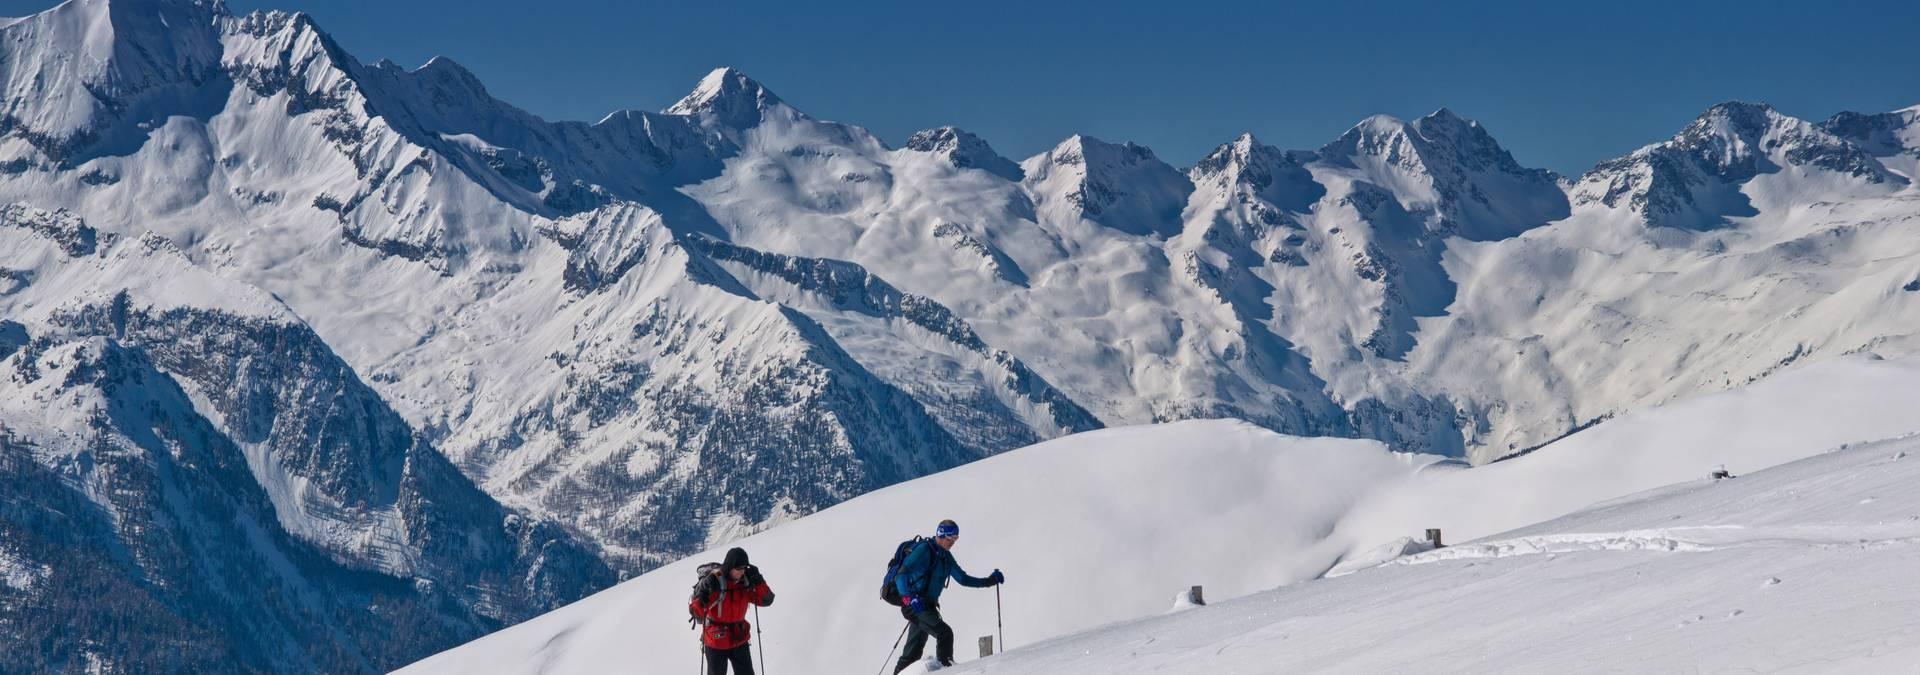 Skitour am Stubeck im Lieser-/Maltatal